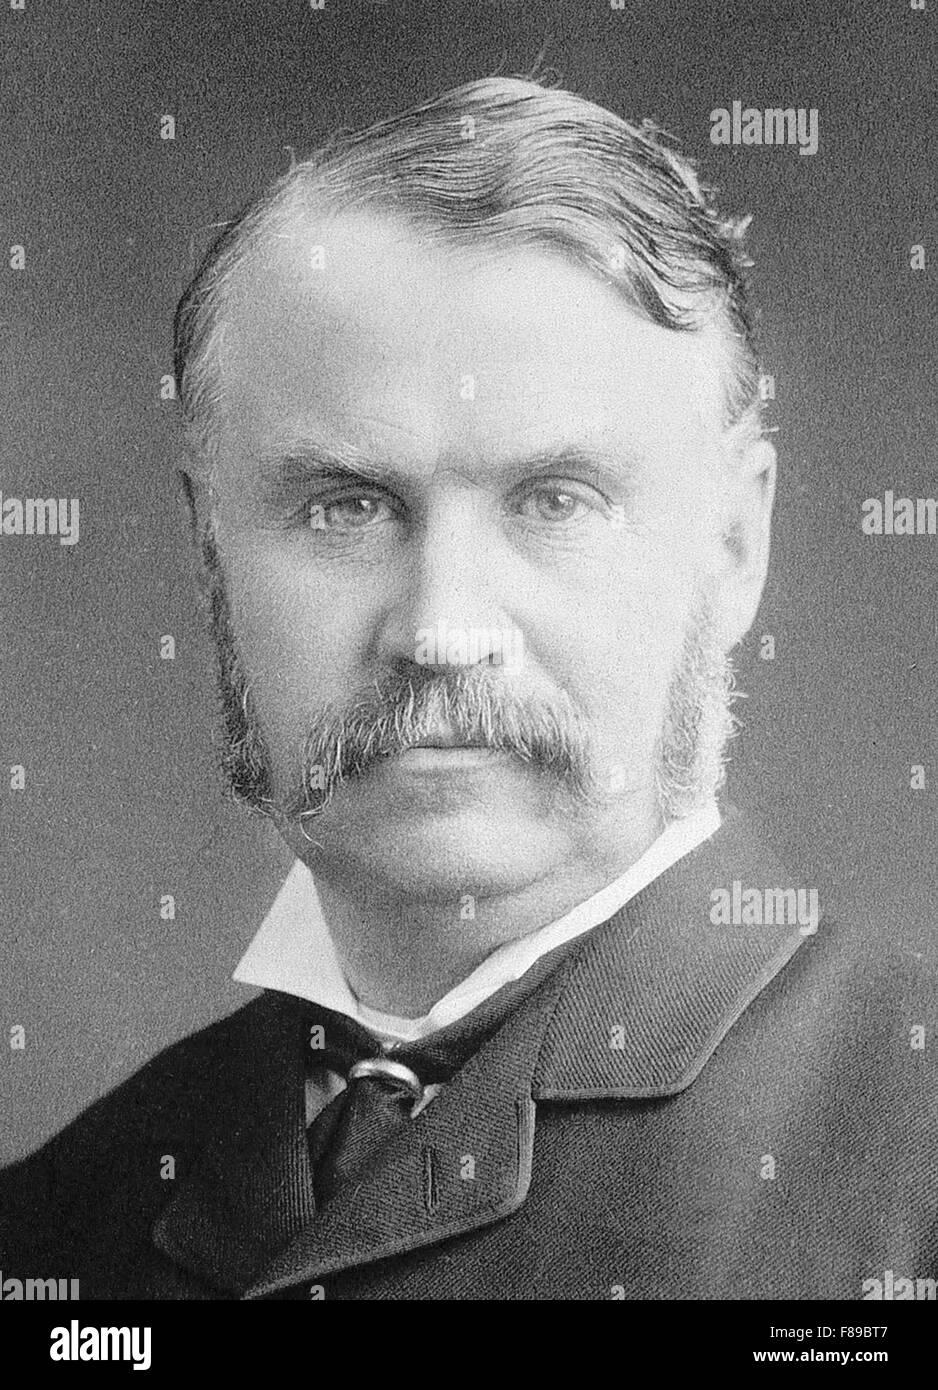 Sir William Schwenck Gilbert, English dramatist - Stock Image